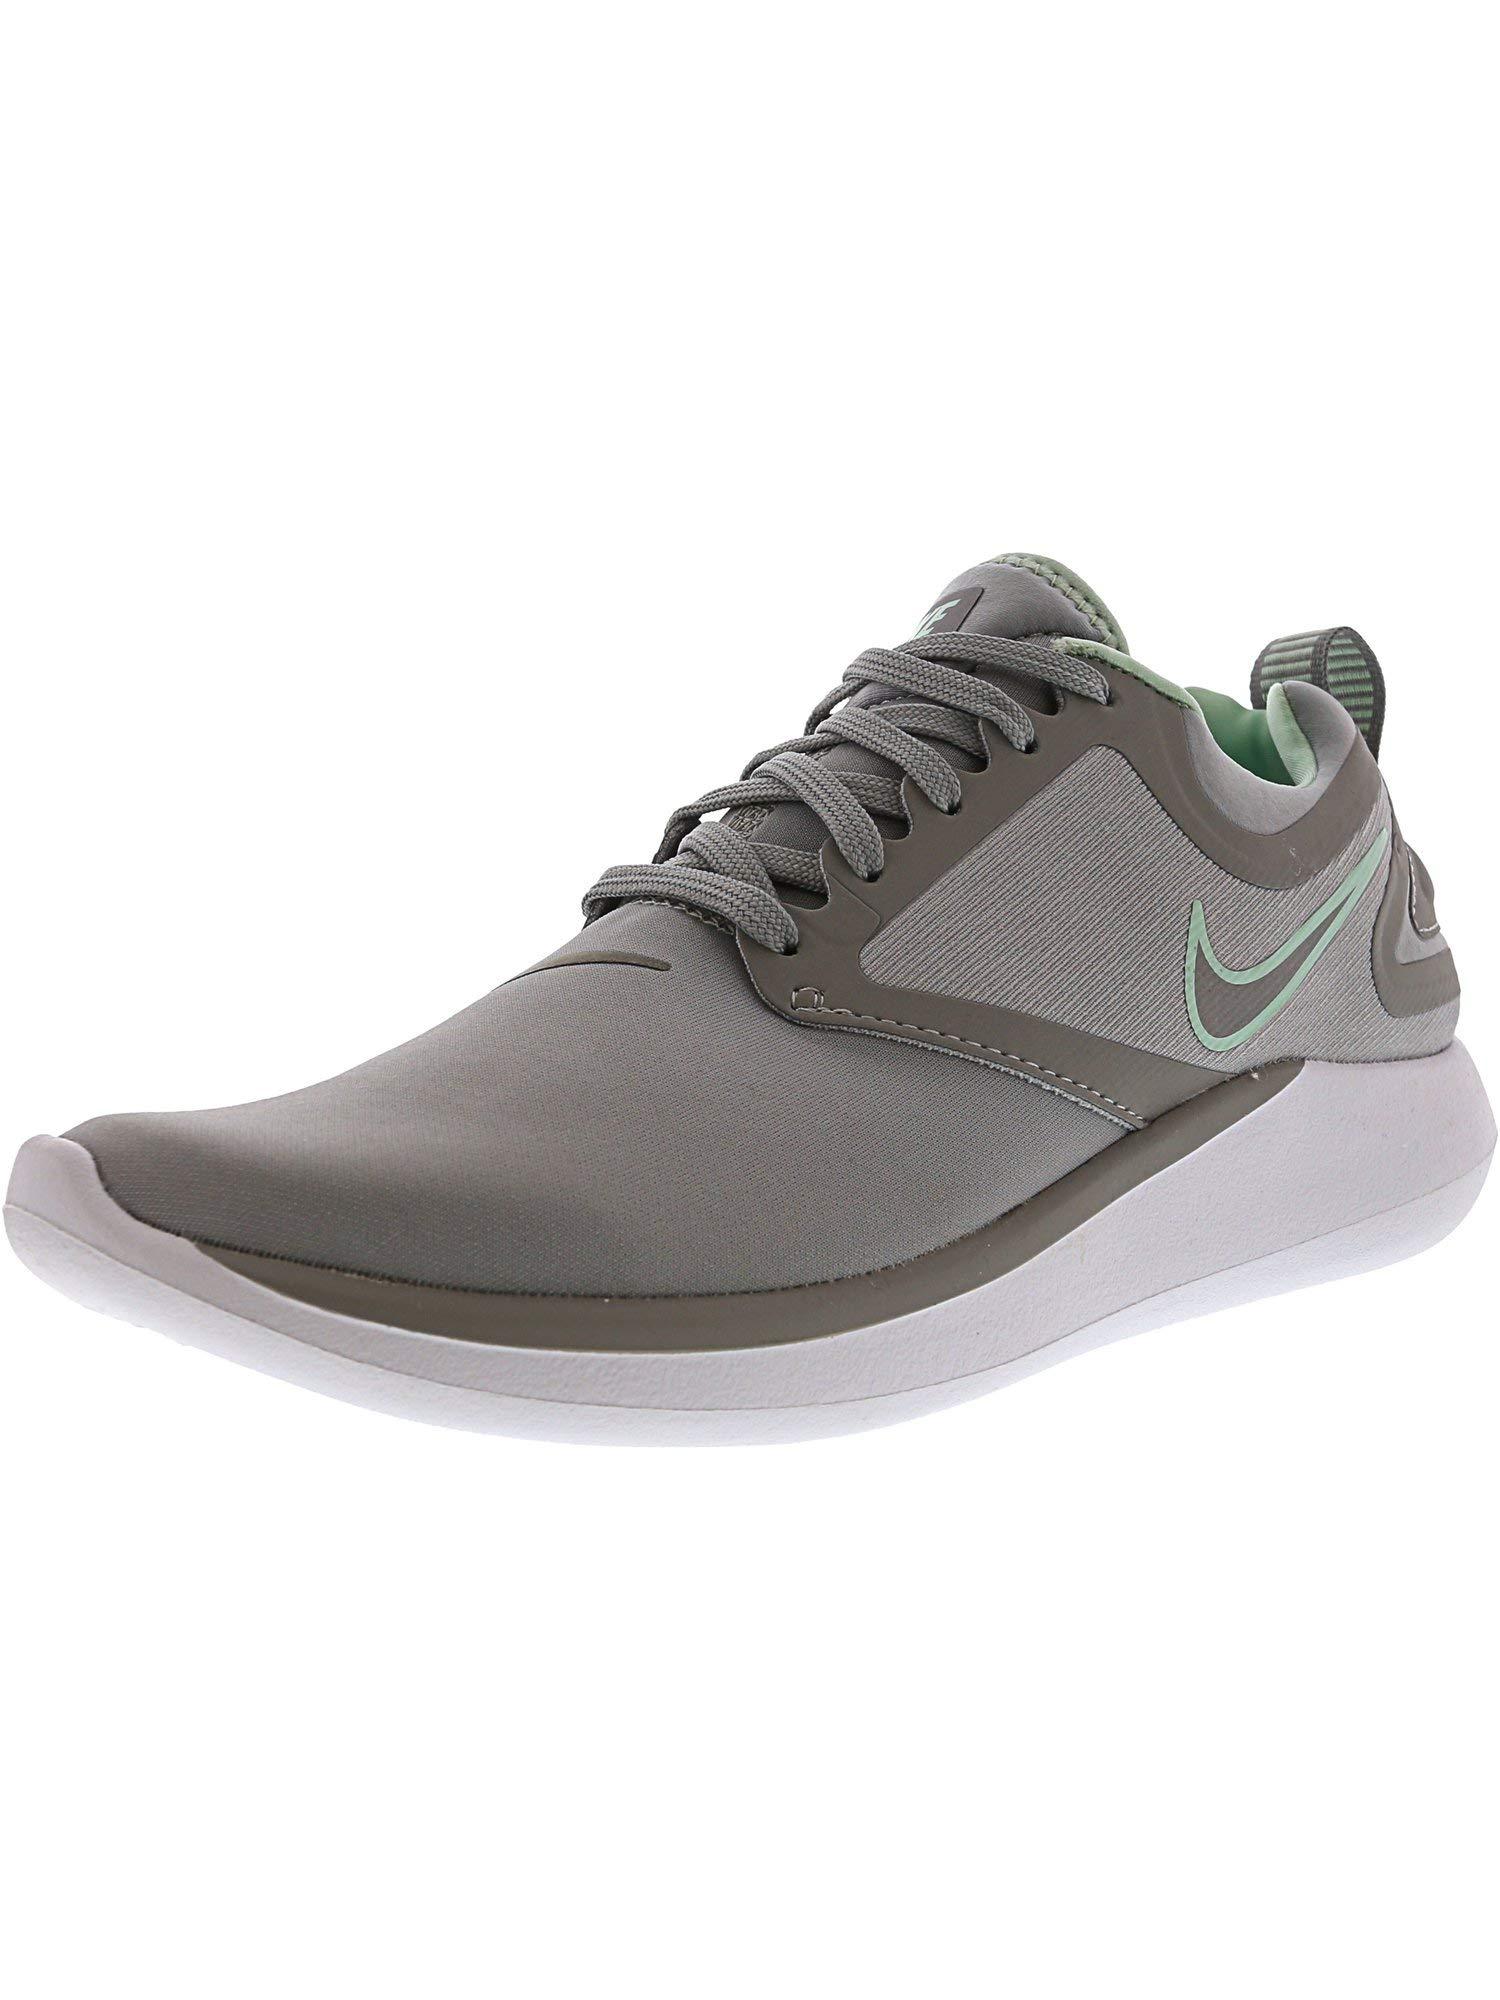 4b1c4759745 Galleon - NIKE Lunarsolo EL Womens Running Shoes